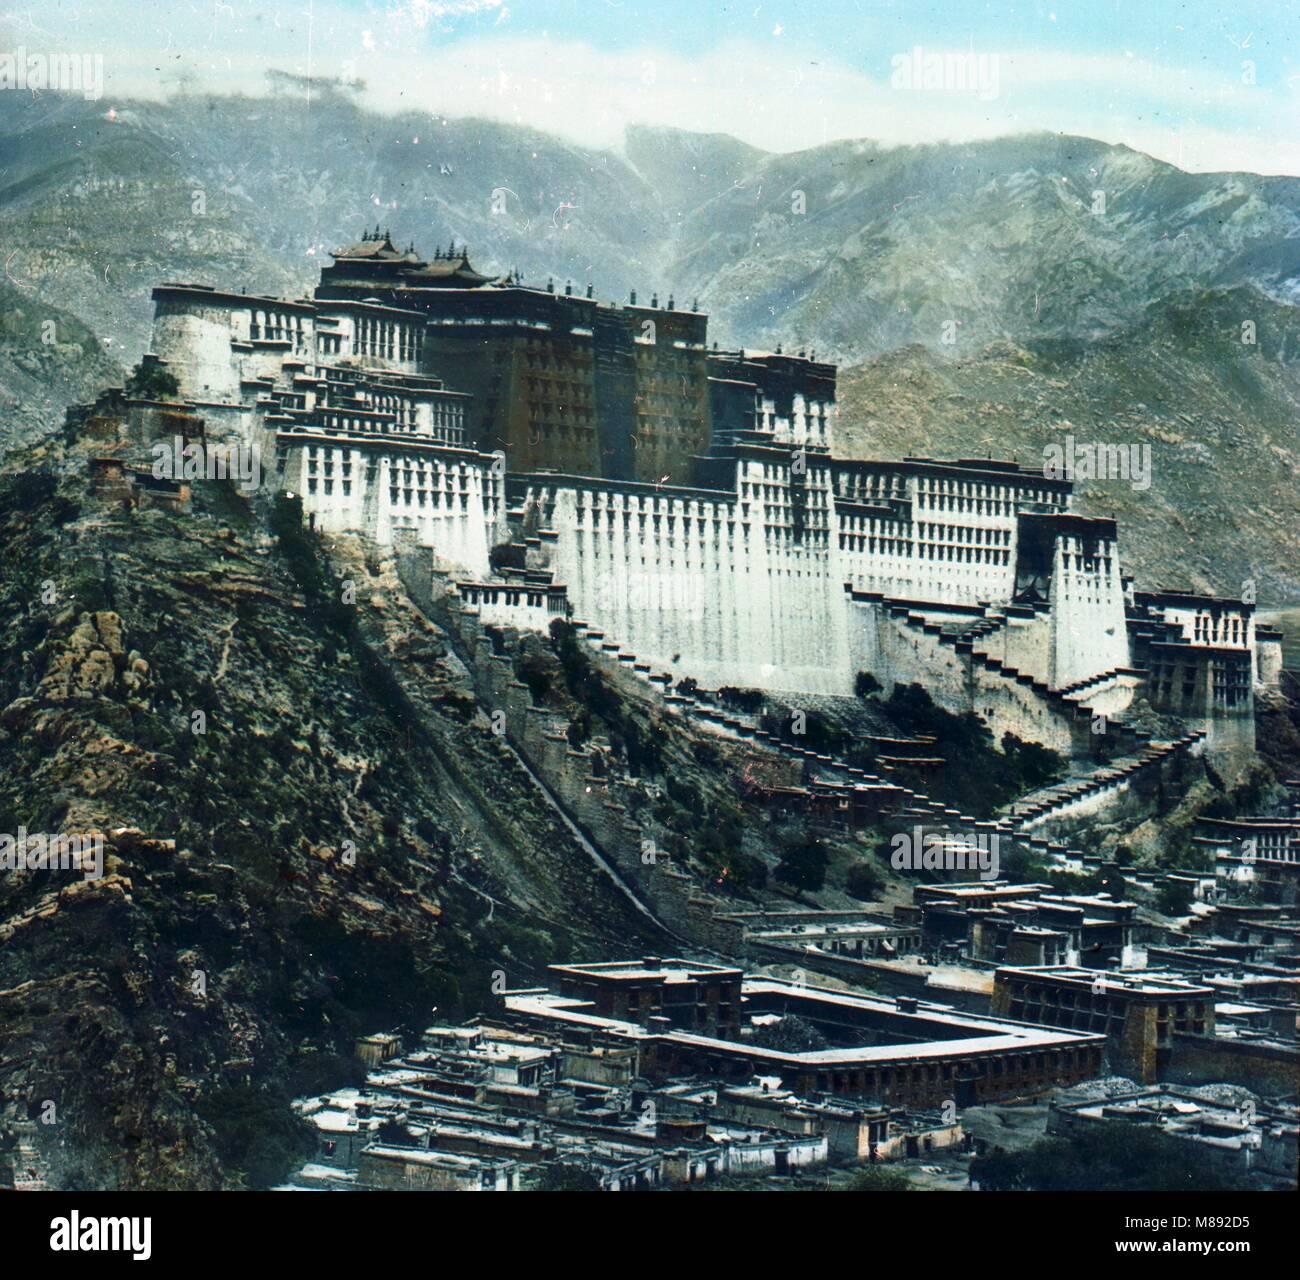 Monastère de Drepung, Tibet, ca 1900 Banque D'Images